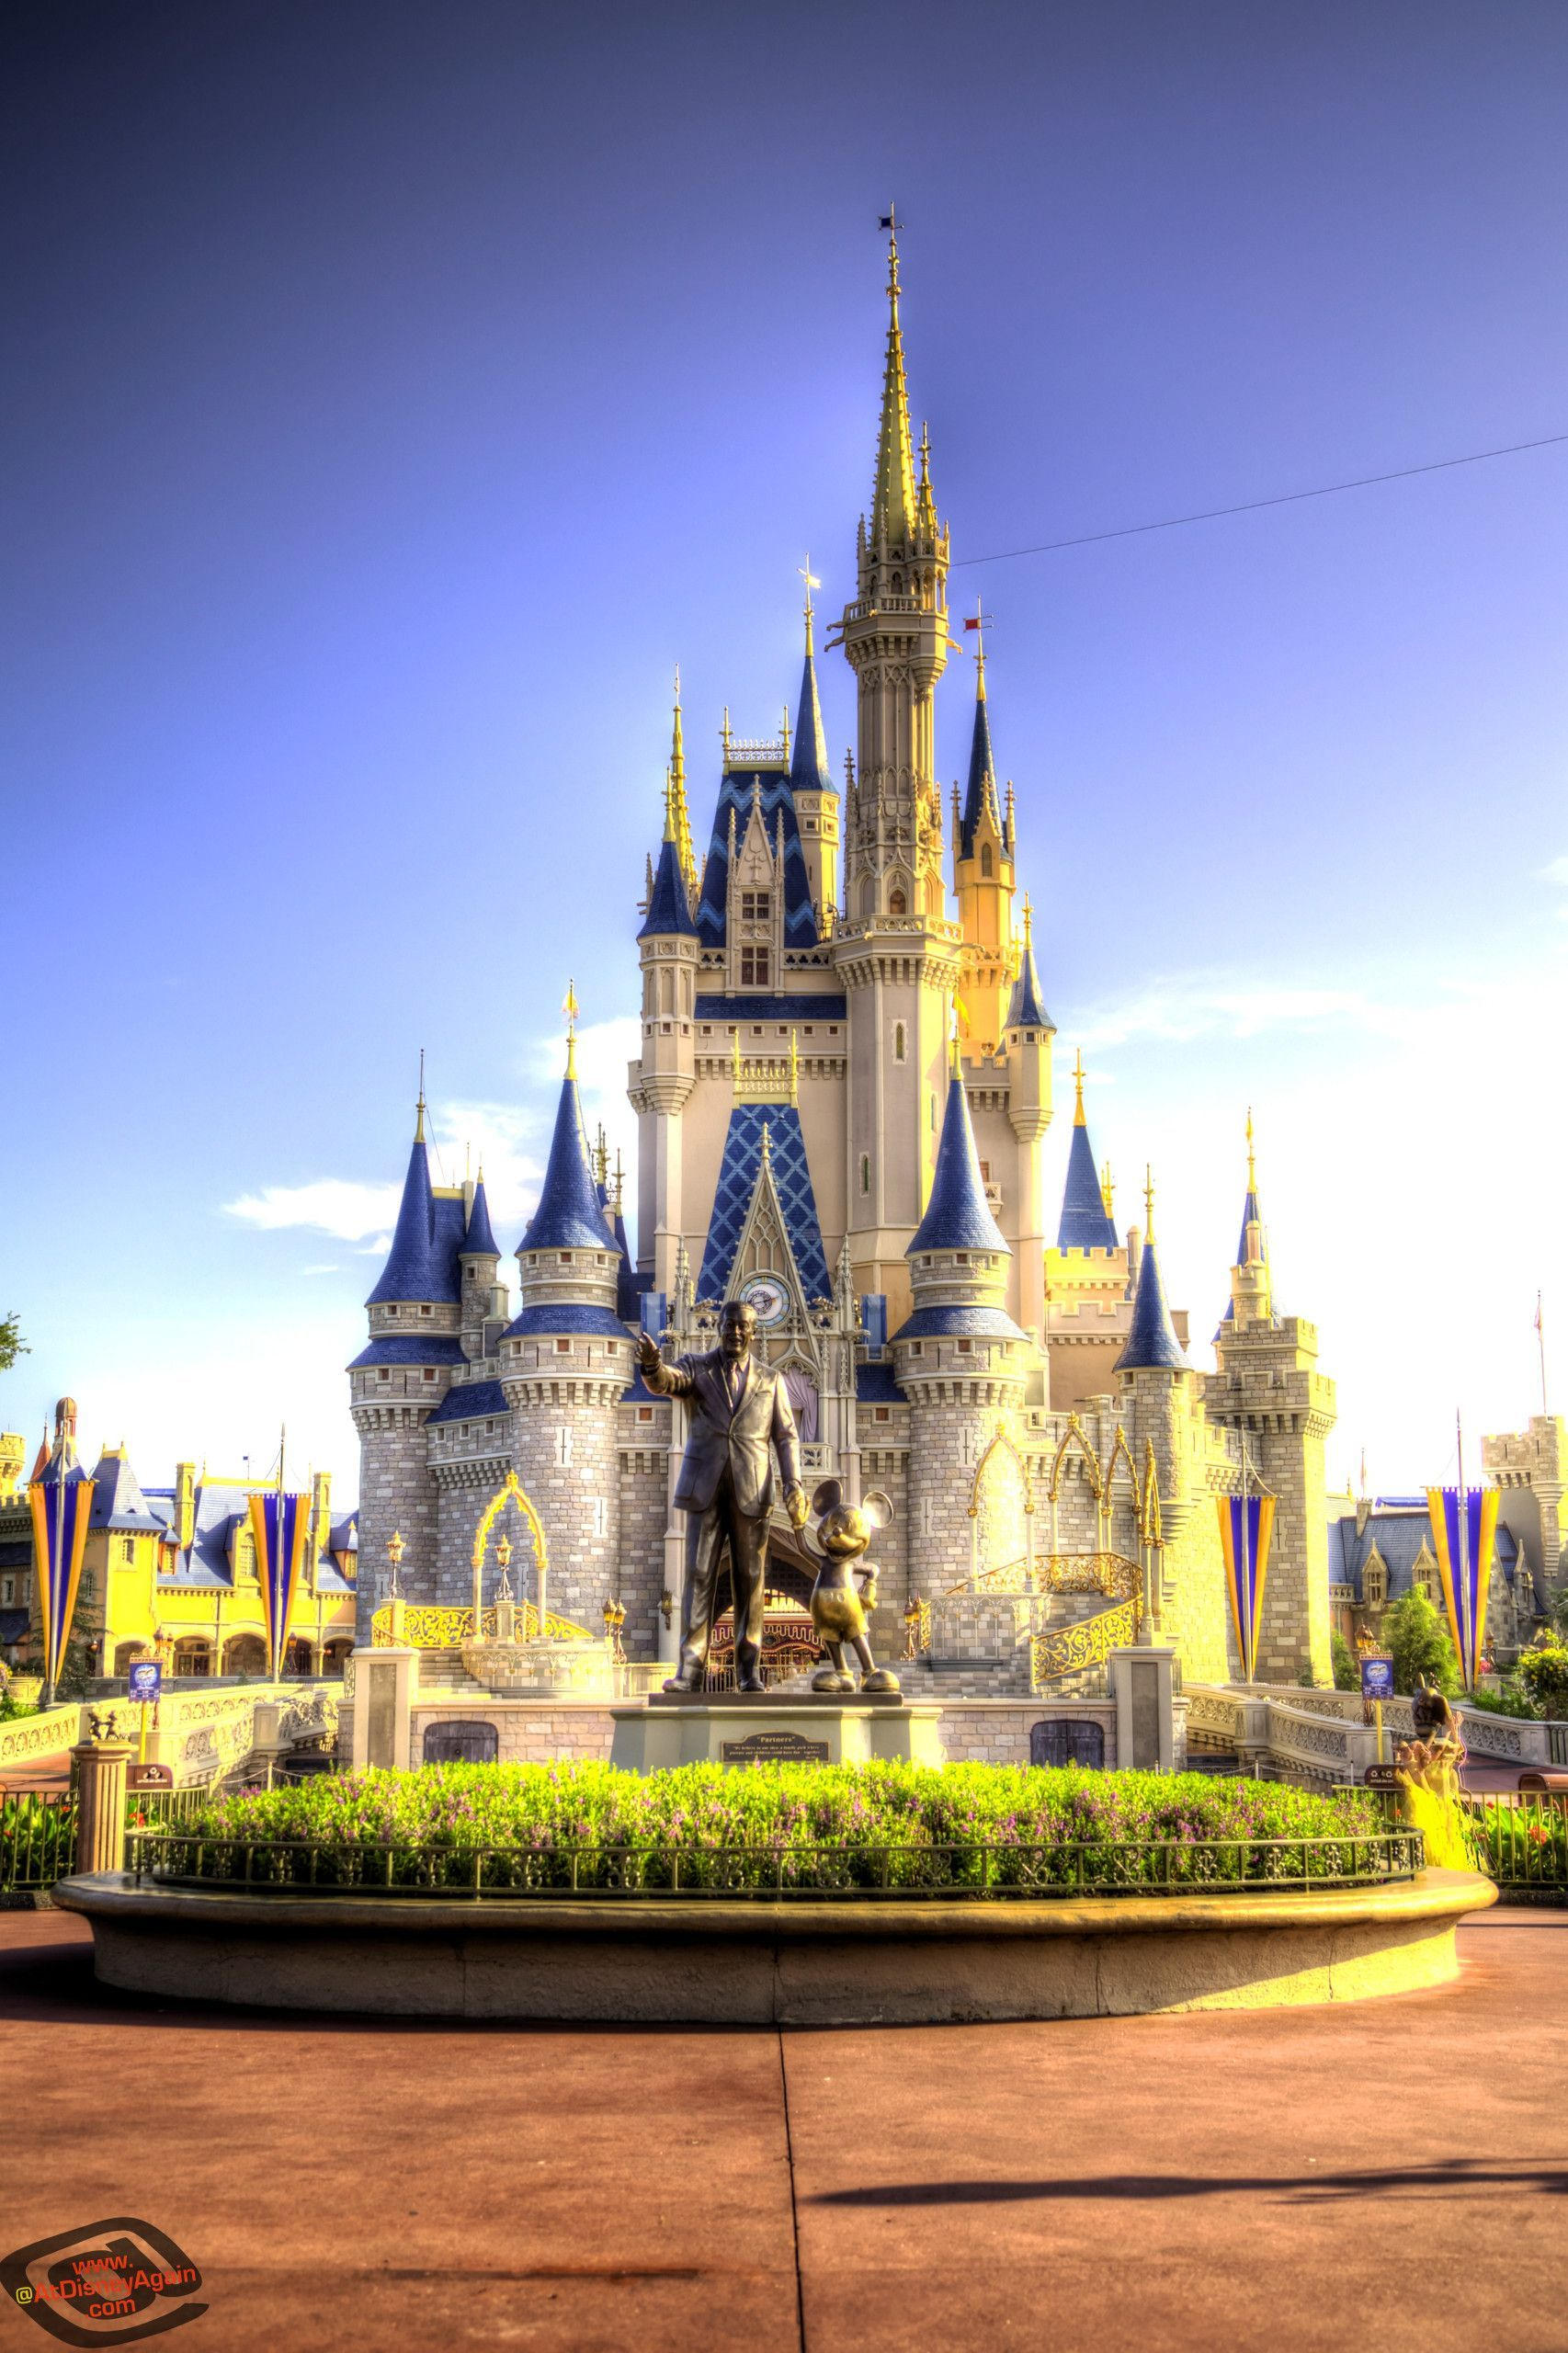 Disney World Wallpapers Top Free Disney World Backgrounds Wallpaperaccess In 2020 Disneyland Castle Disney Castle Disney Princess Background